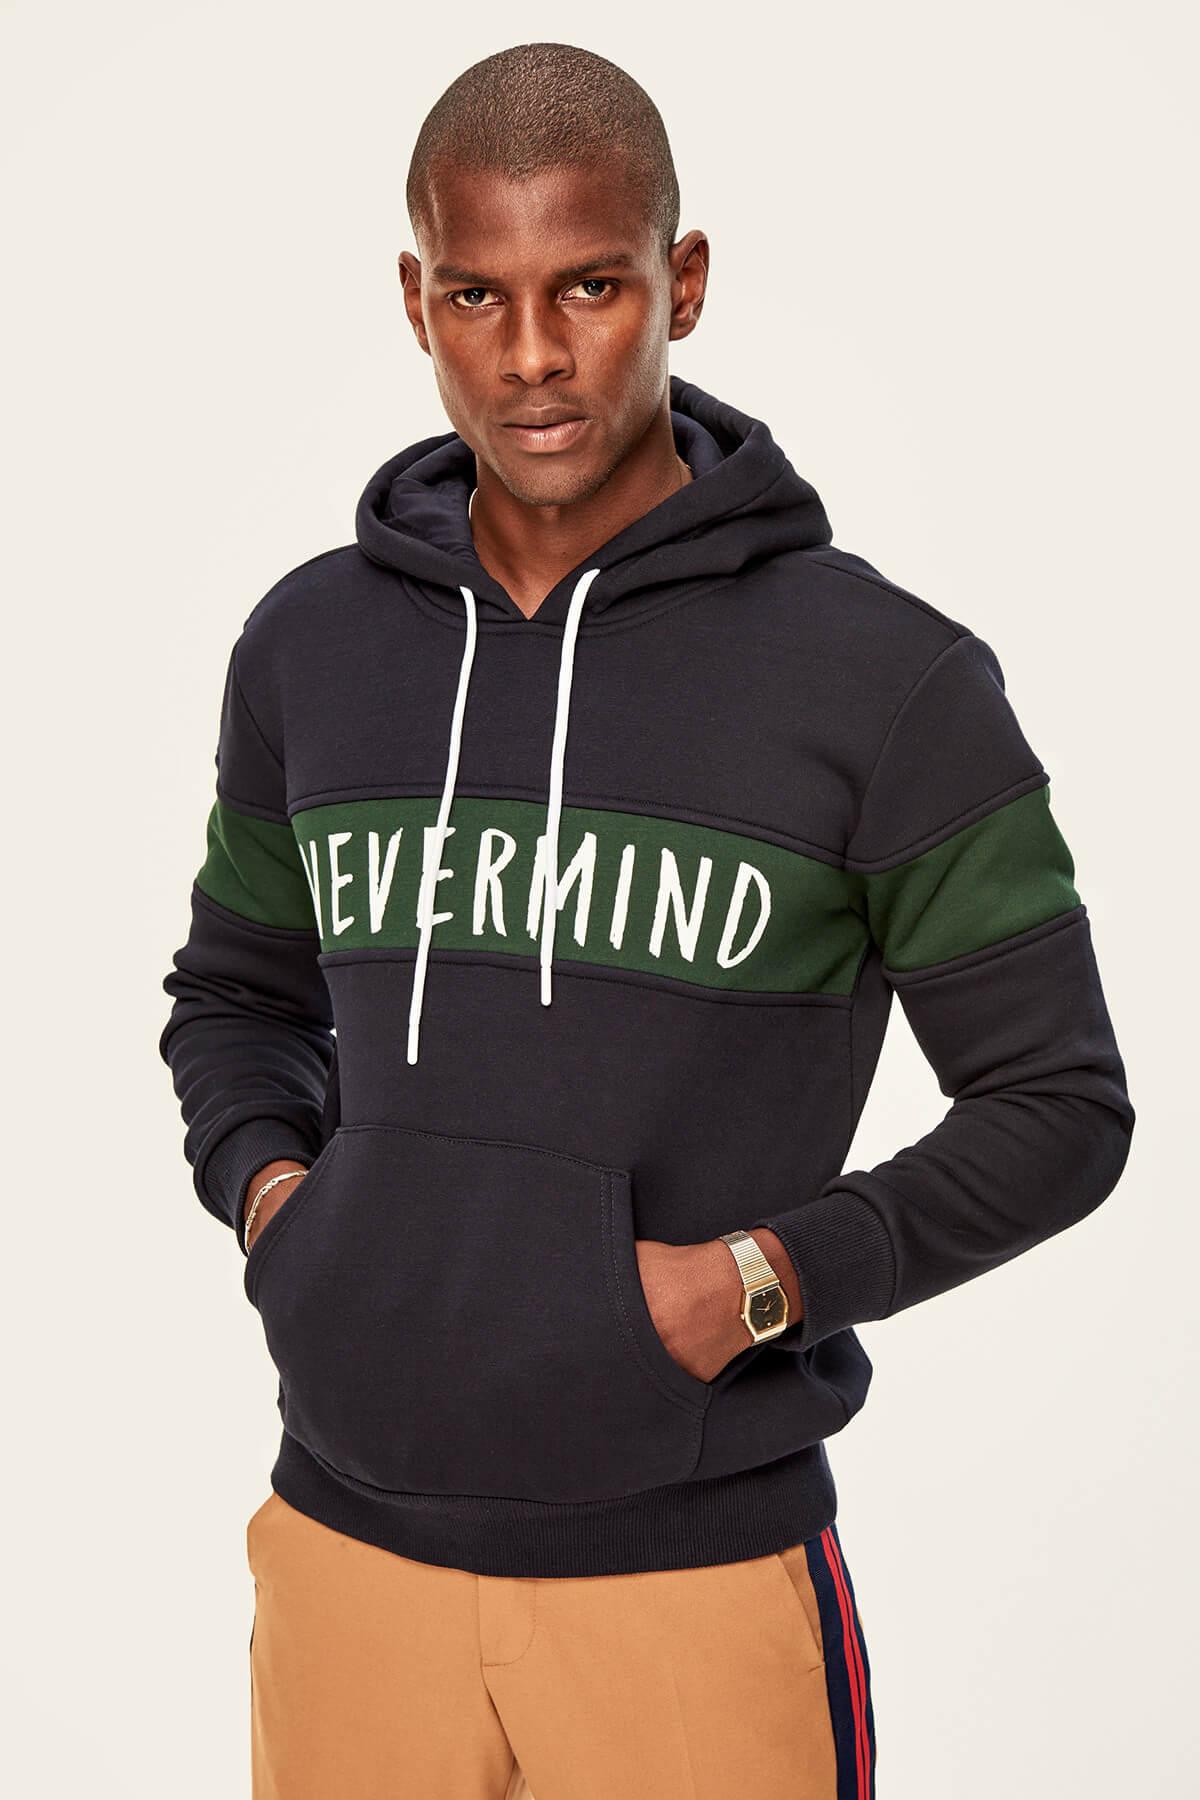 Trendyol Navy Men's Sweatshirts-Hooded Hissinde Graphics On-Polar-Printed